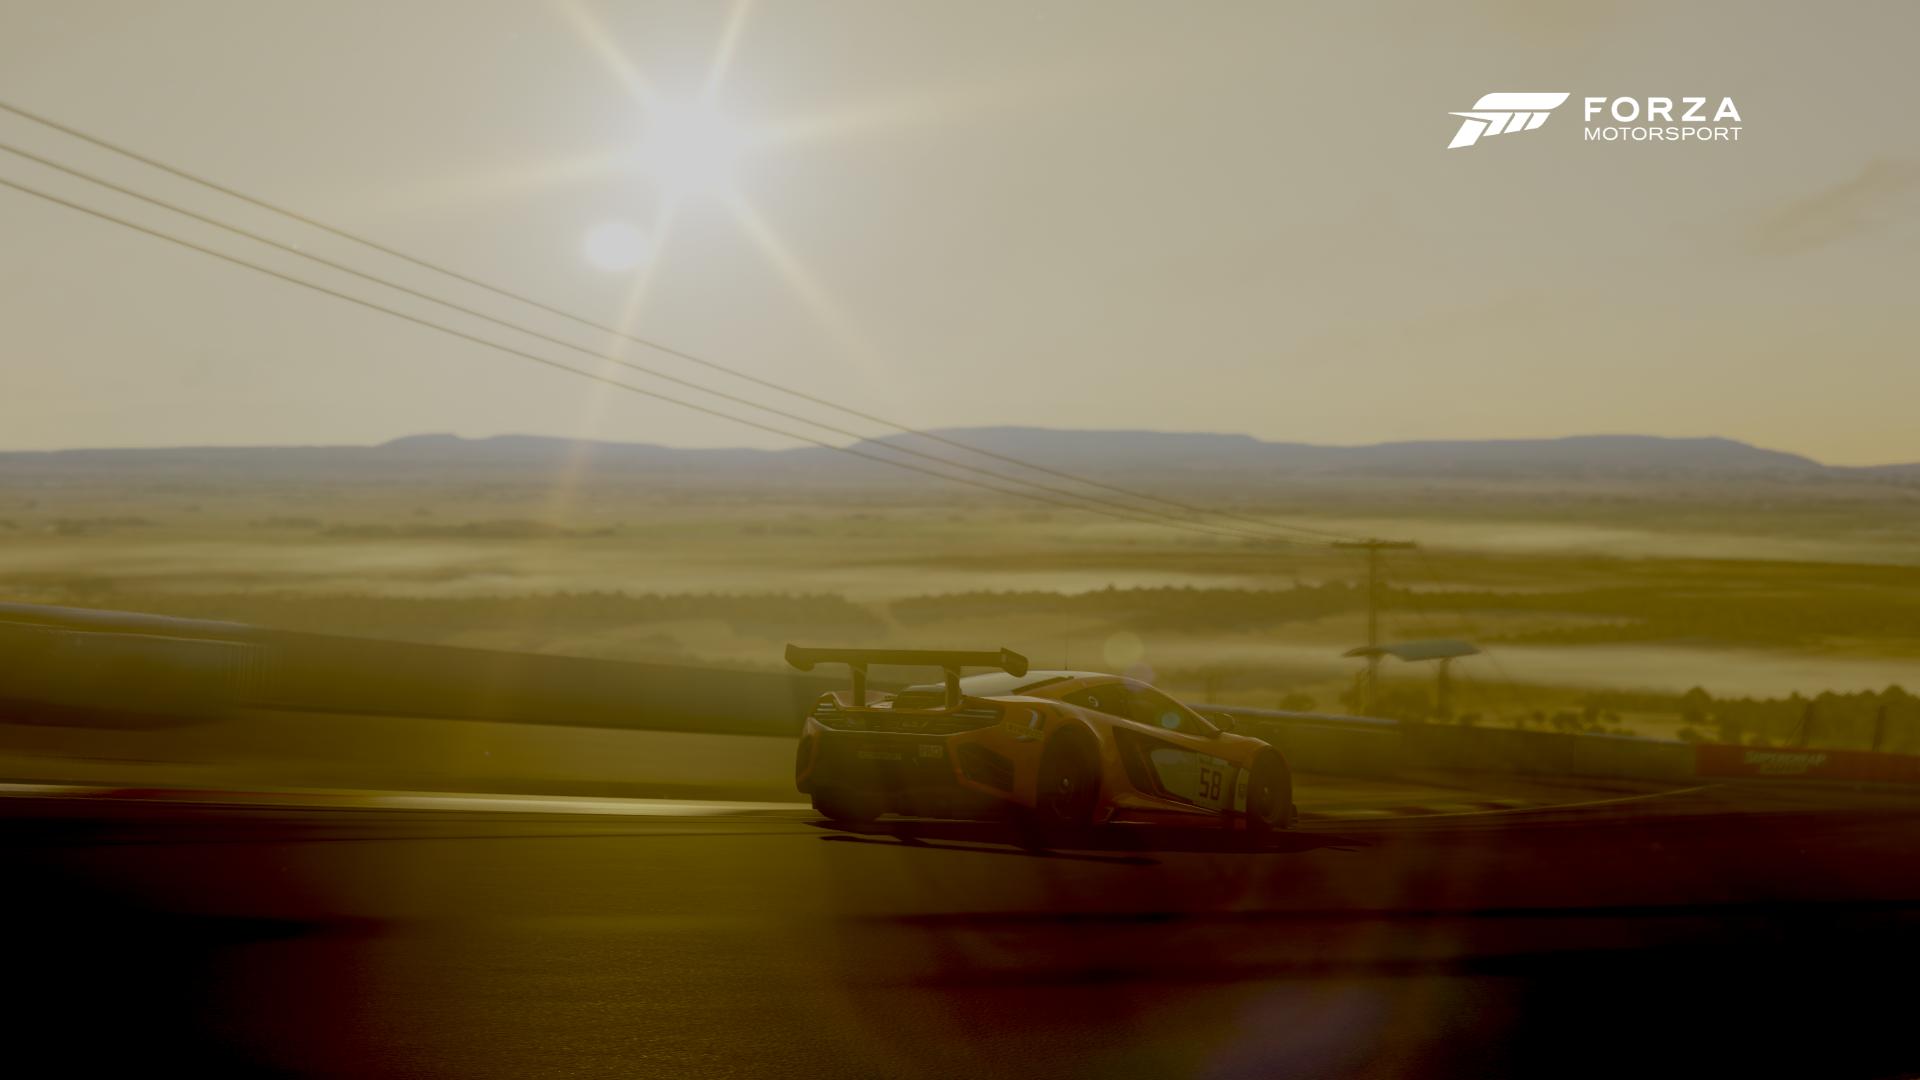 Forza Motorsport 6 (35).png